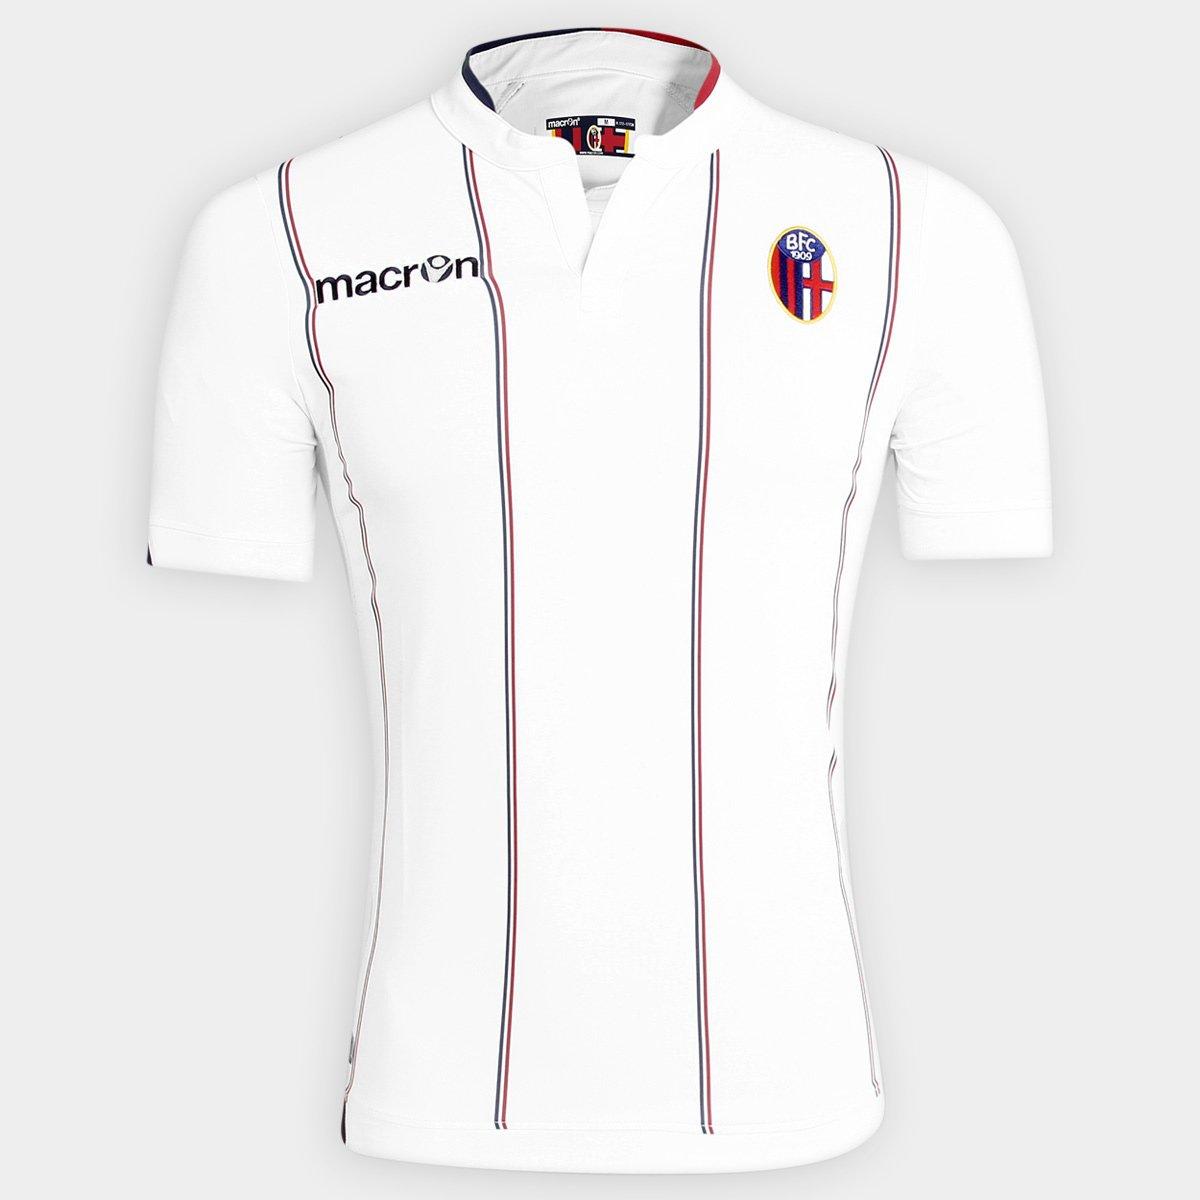 bd67153892 Camisa Bologna II 14 15 s nº - Torcedor Macron Masculina - Compre Agora